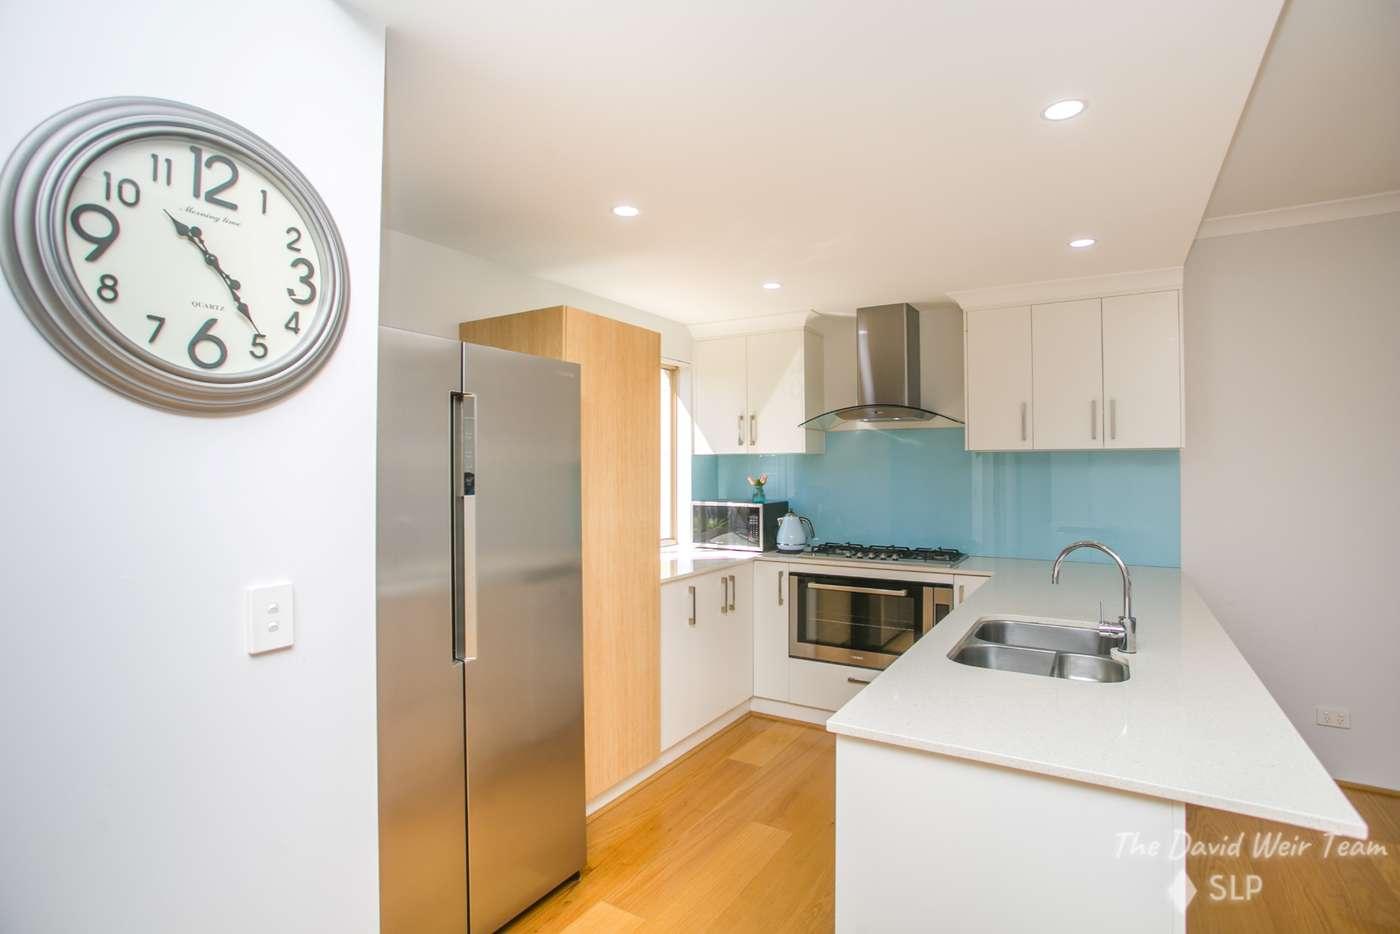 Sixth view of Homely house listing, 5 Maltarra Street, Nollamara WA 6061